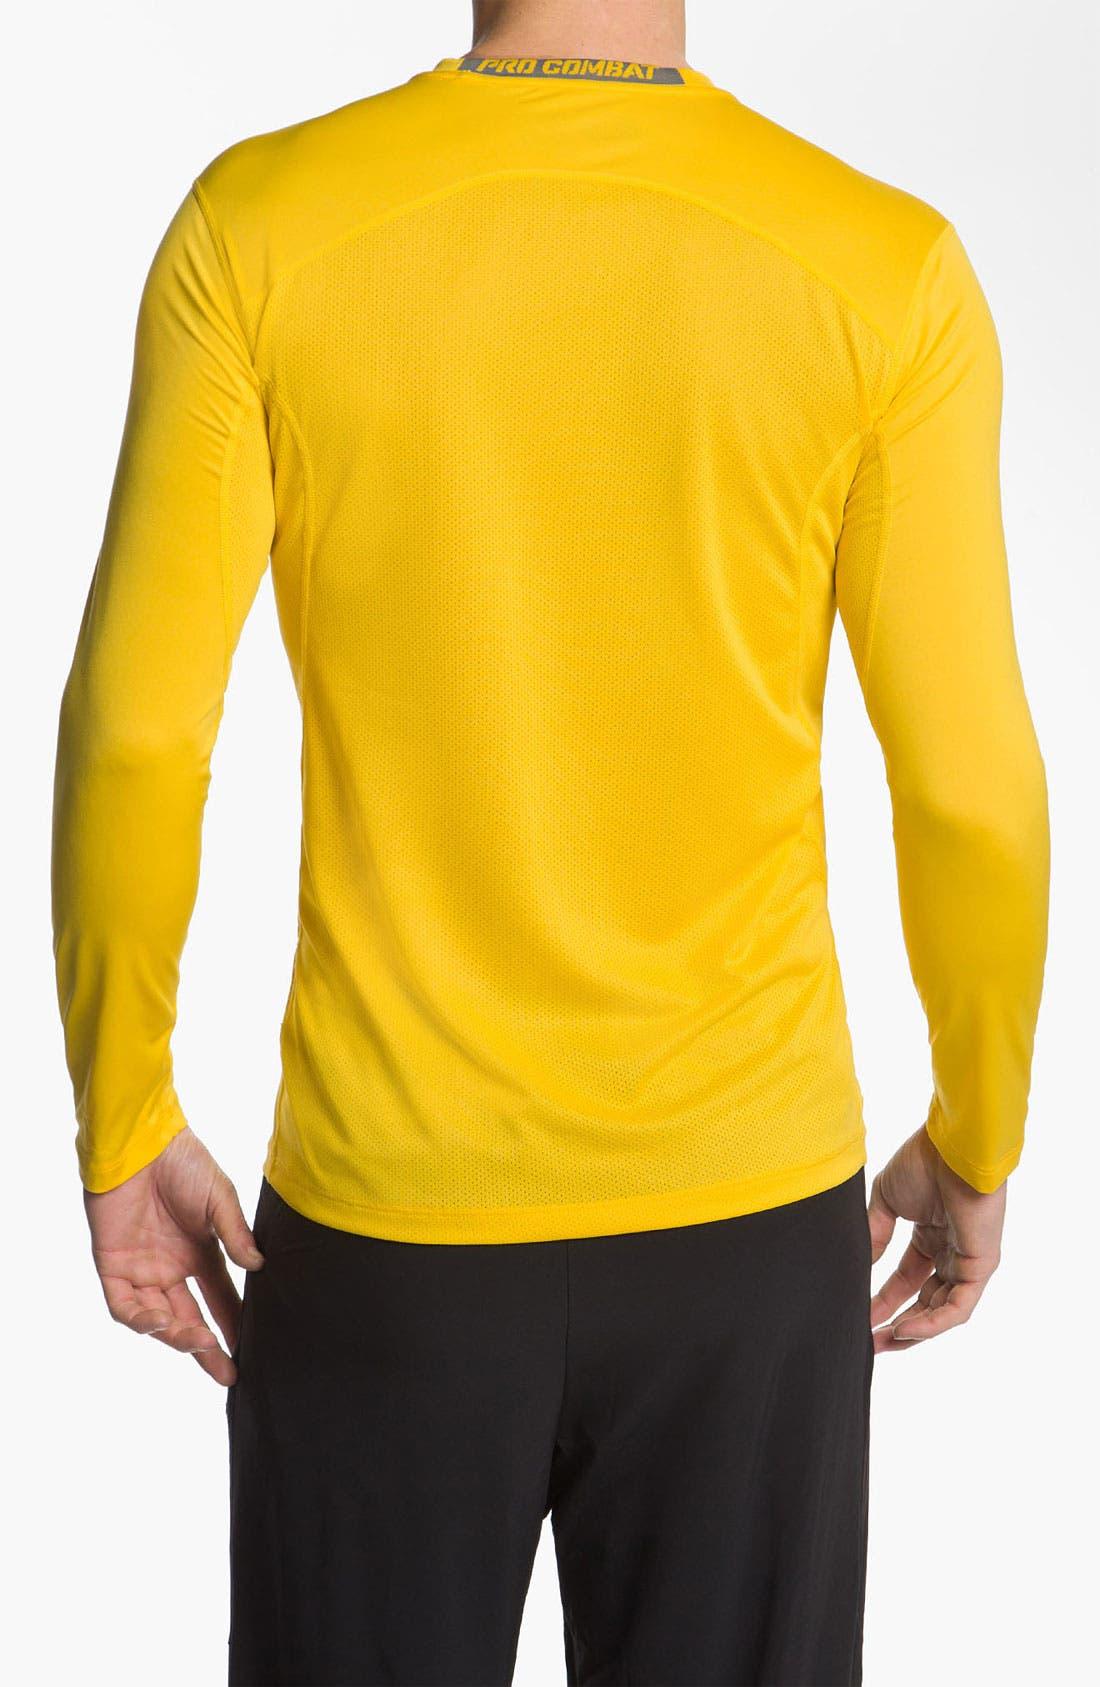 Alternate Image 2  - Nike 'Core 2.0' Fitted Long Sleeve T-Shirt (Regular Retail Price: $32.00)